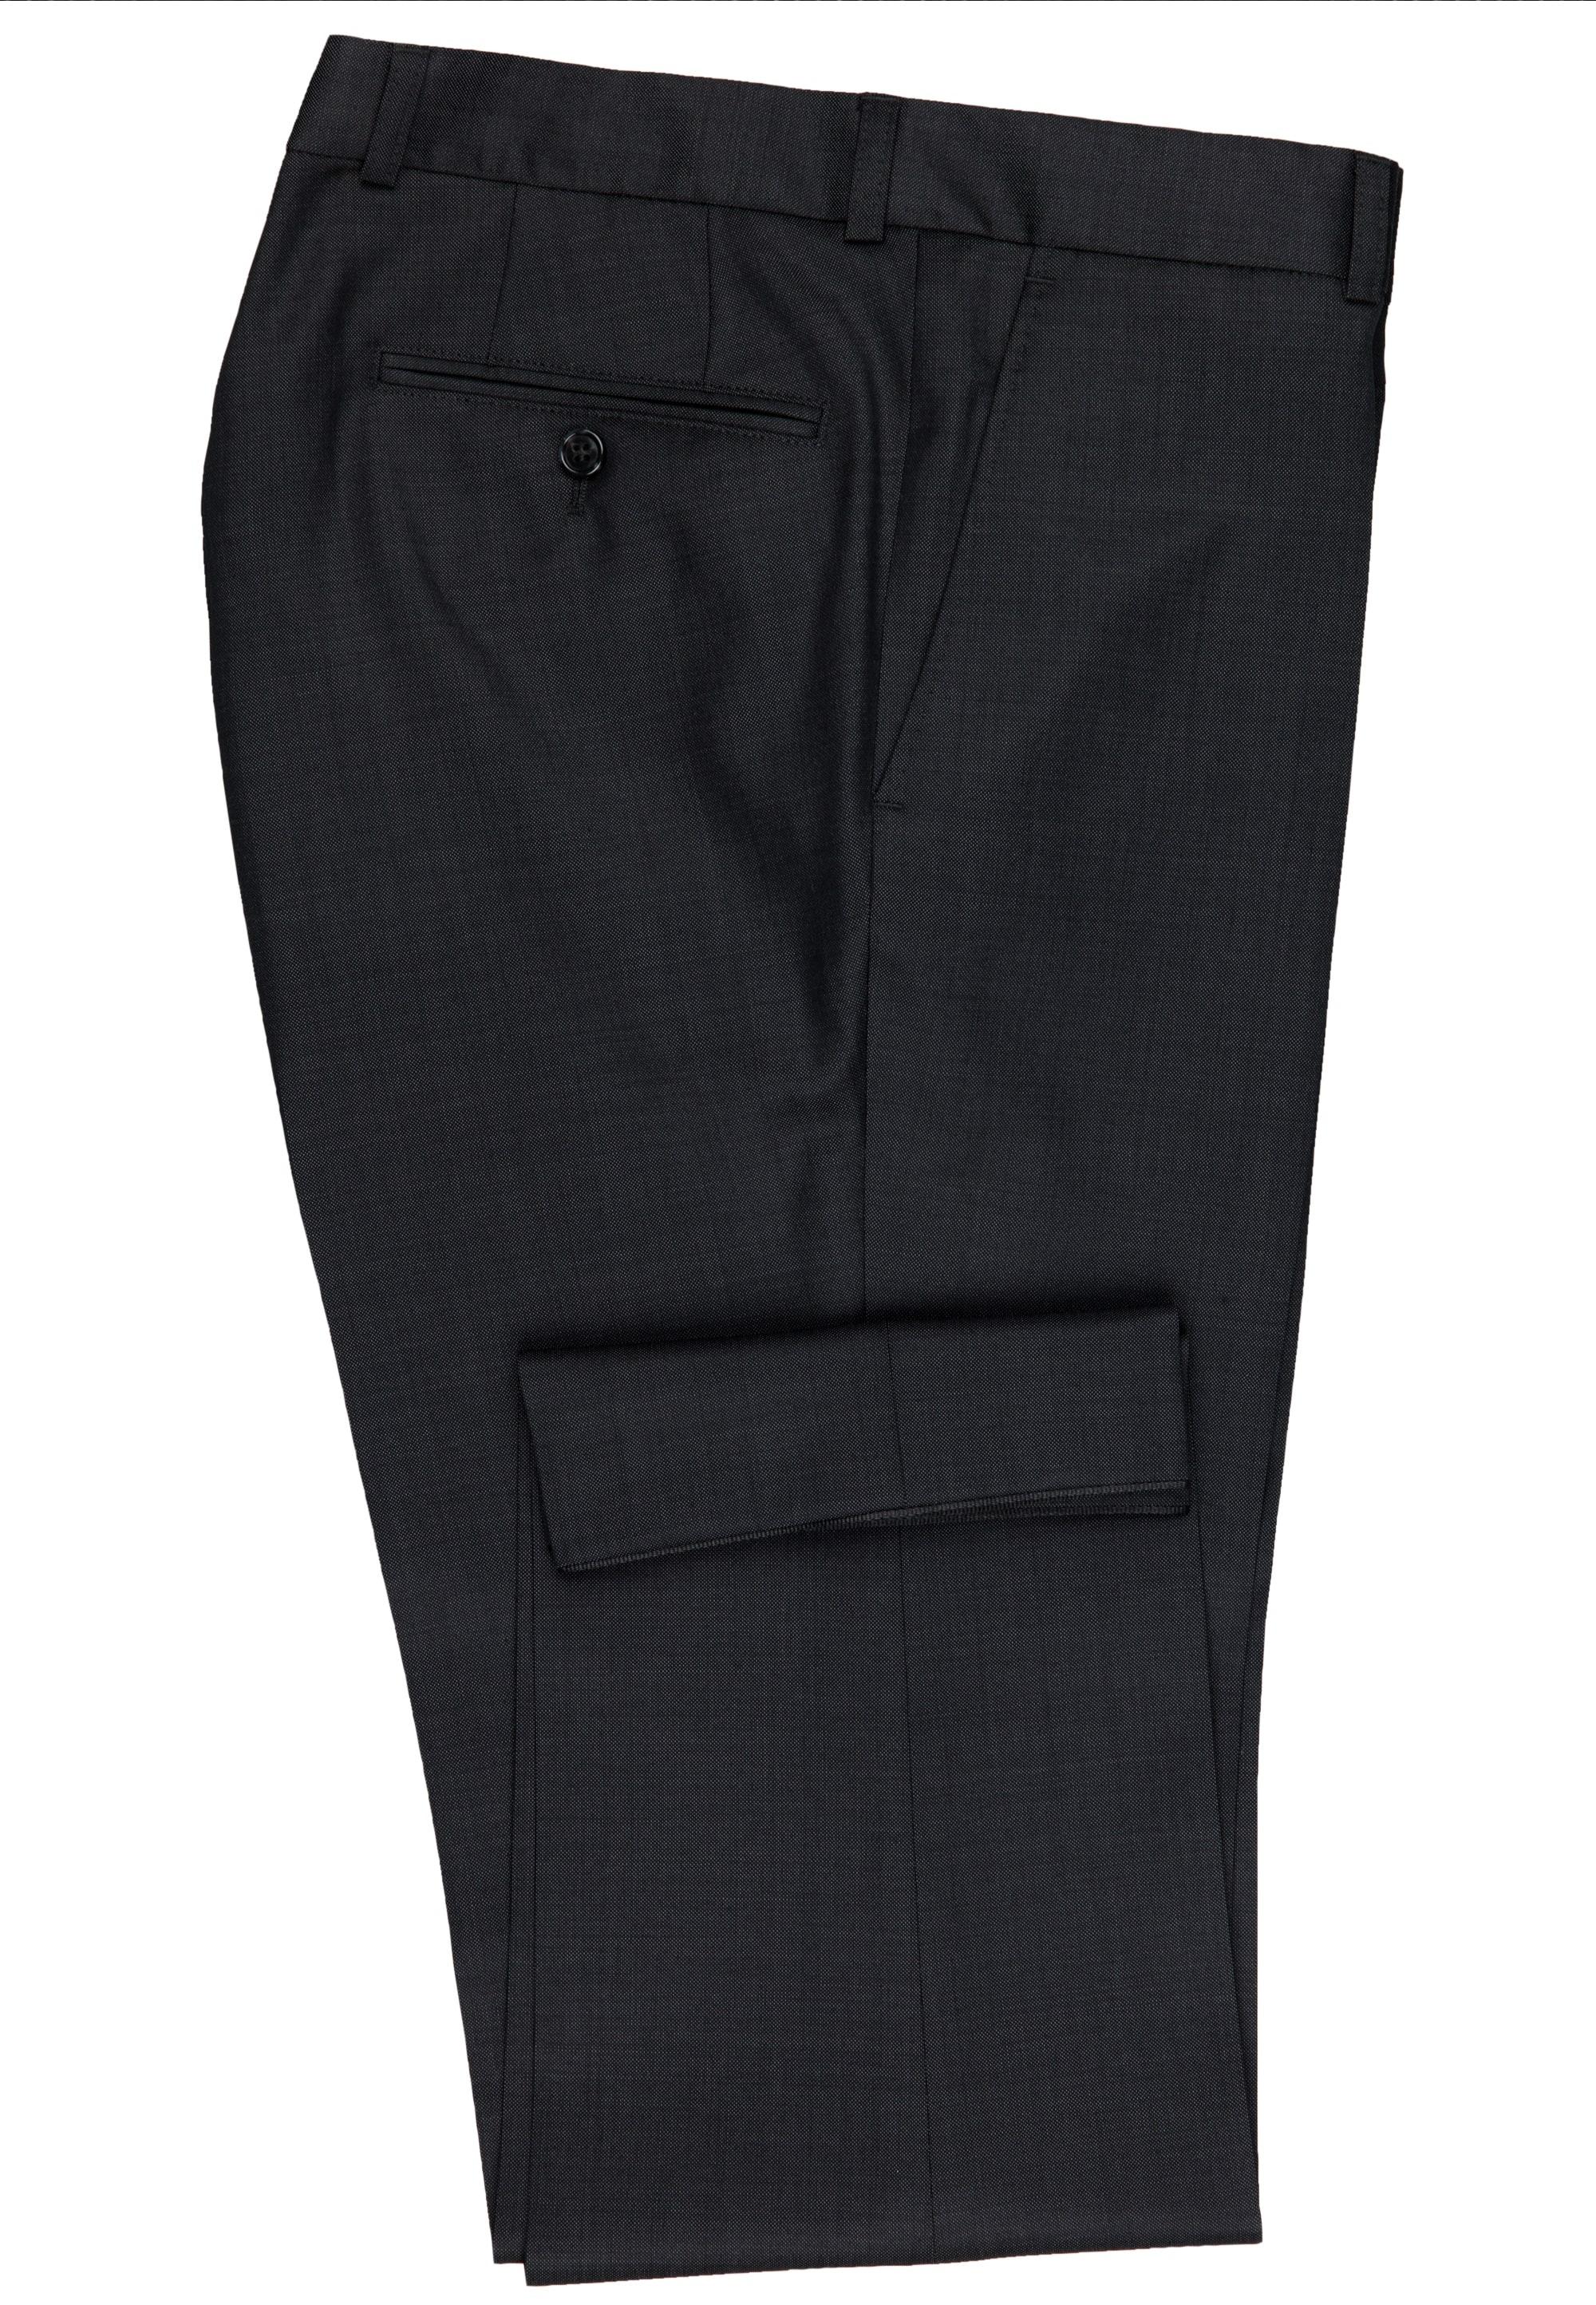 Hose/trousers Sascha